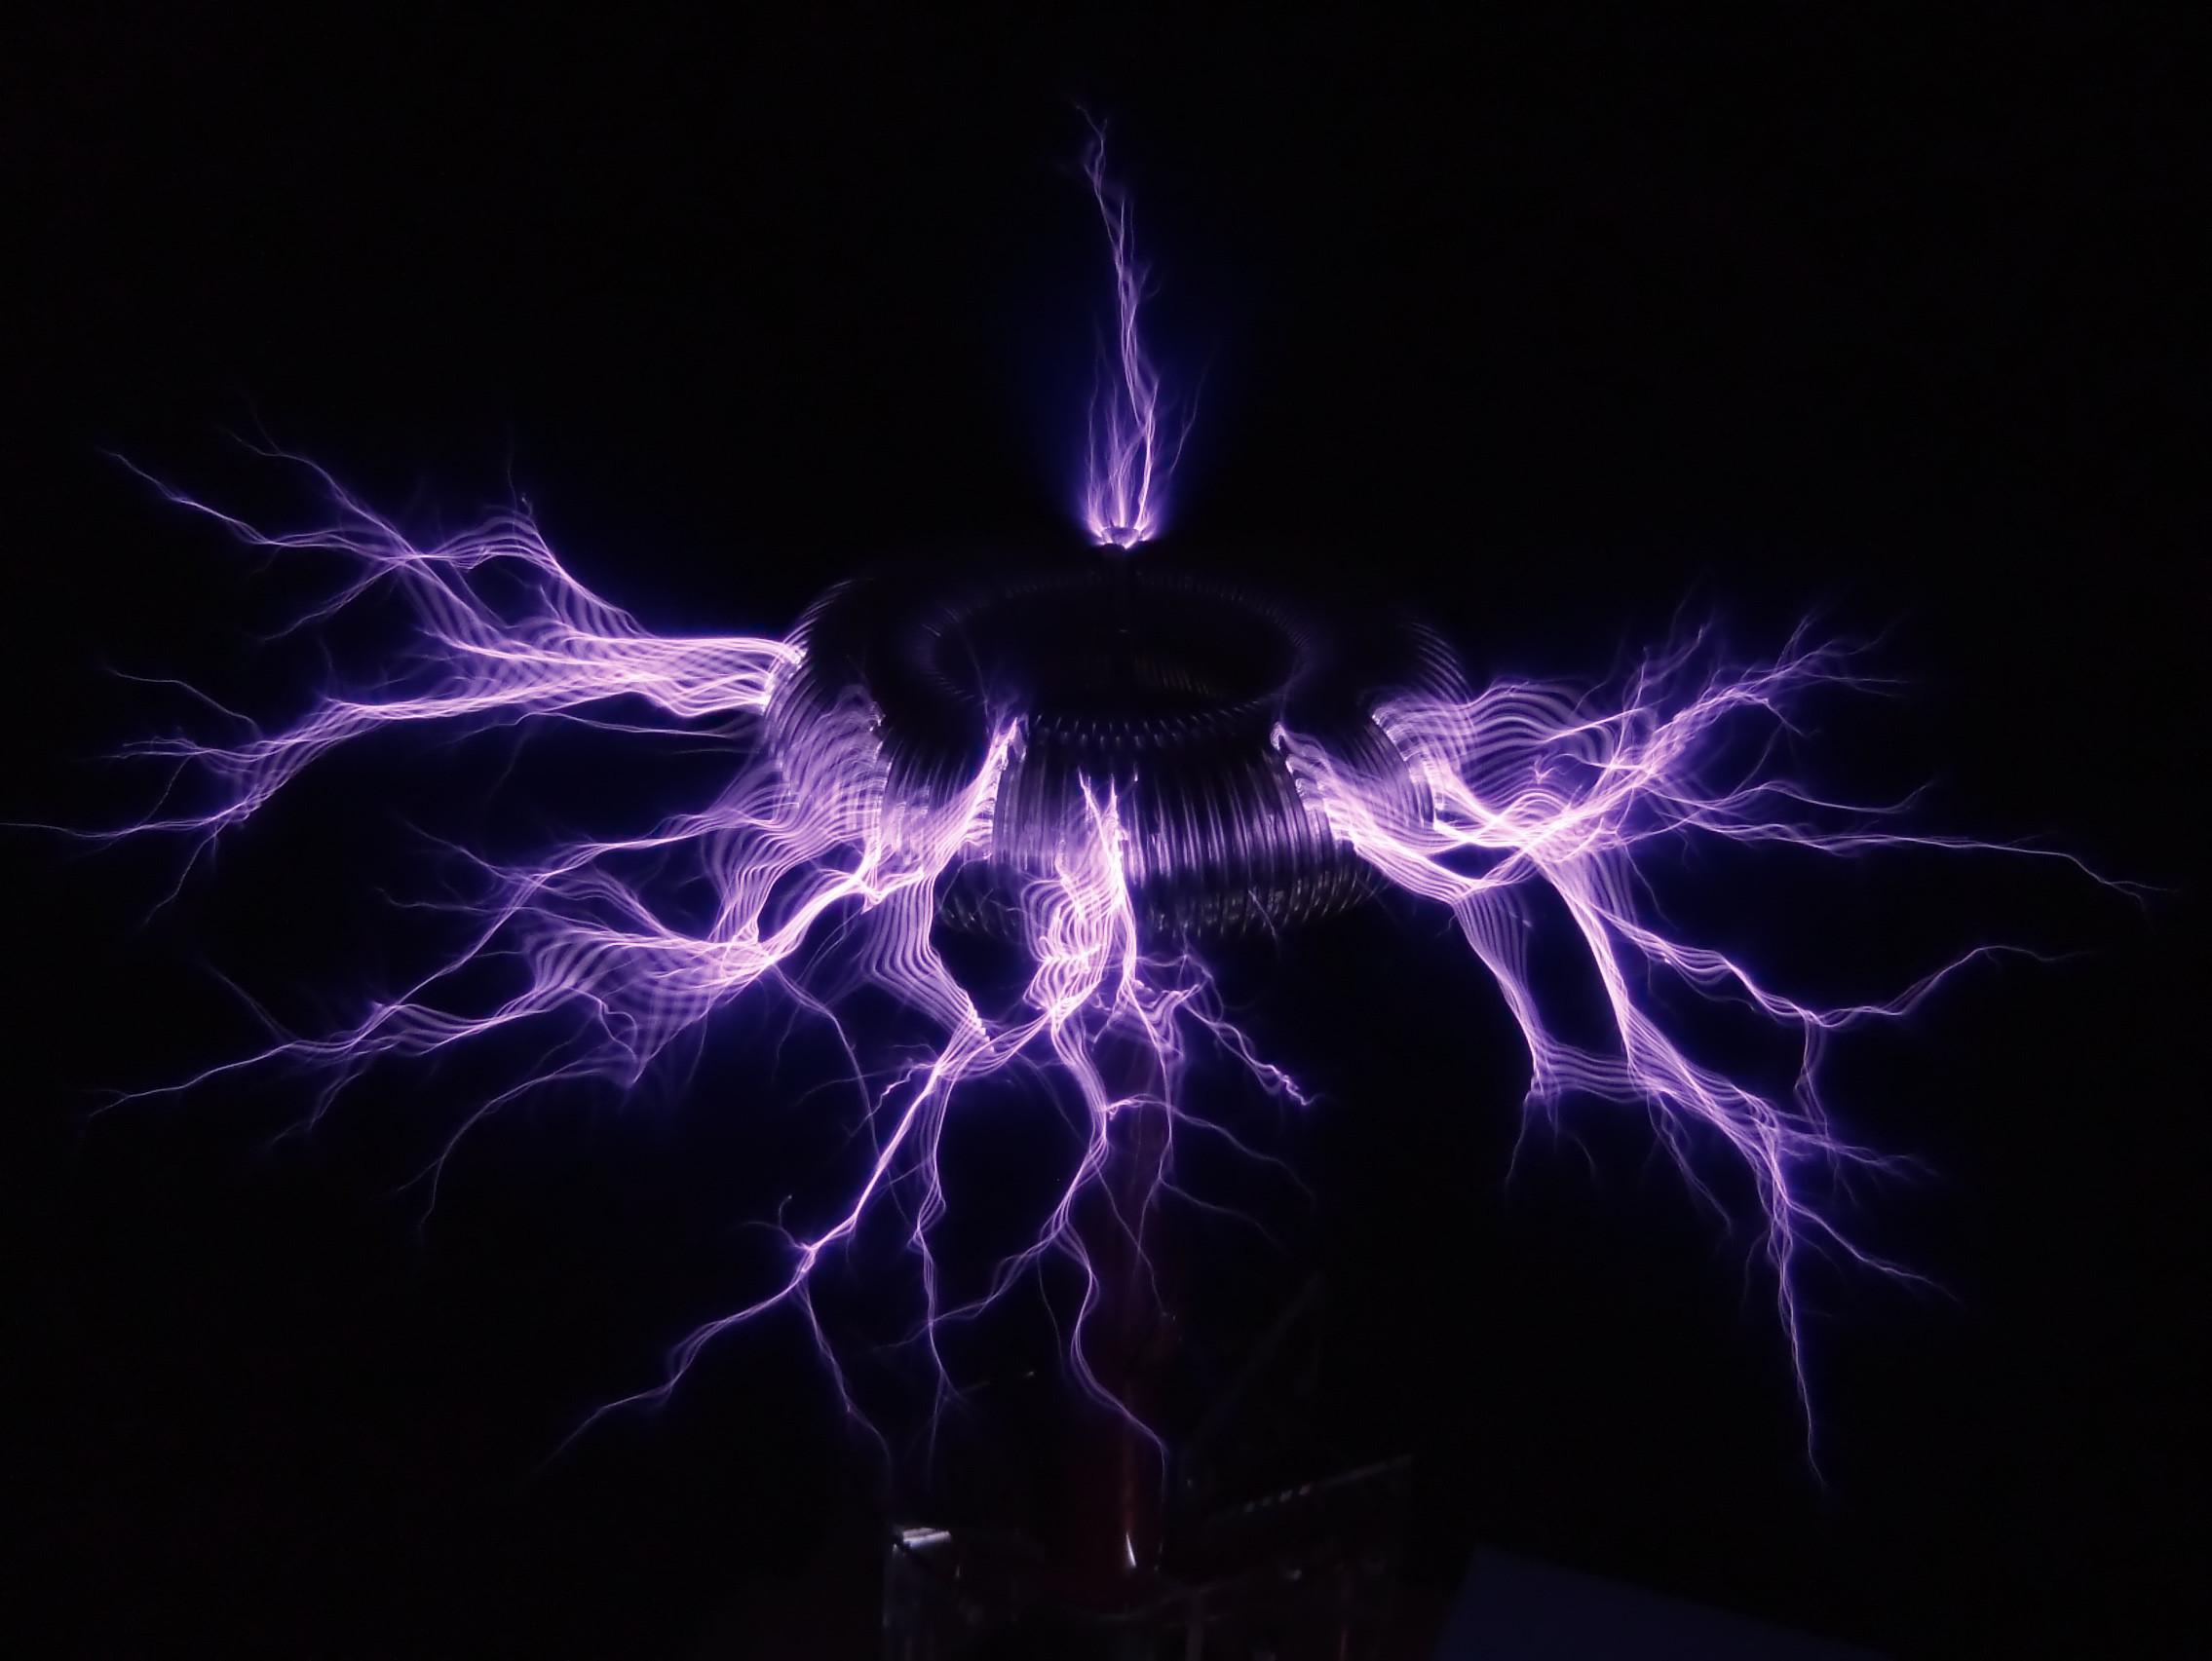 Back > Wallpapers For > Nikola Tesla Coil Wallpaper